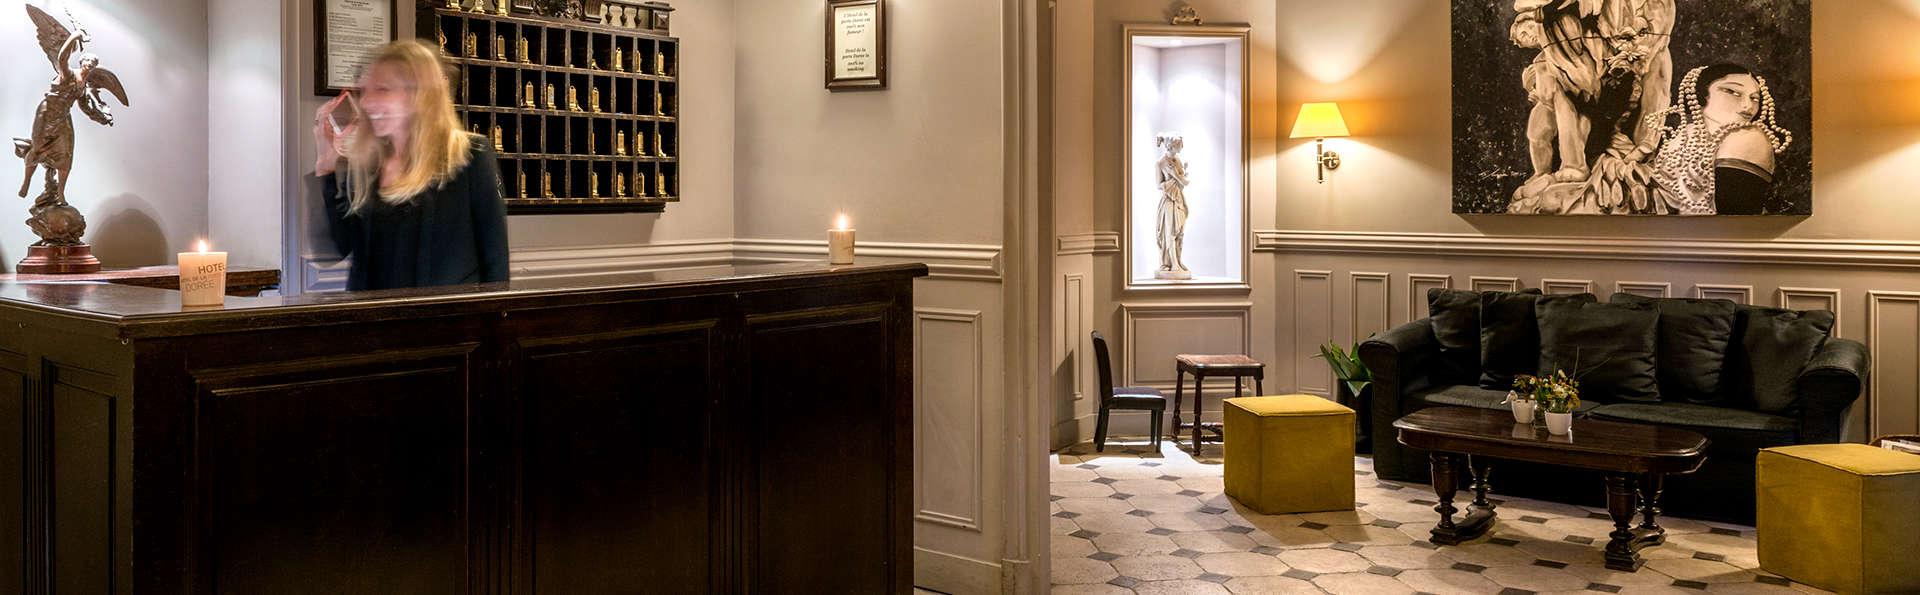 Hôtel Porte Dorée - Edit_Reception.jpg